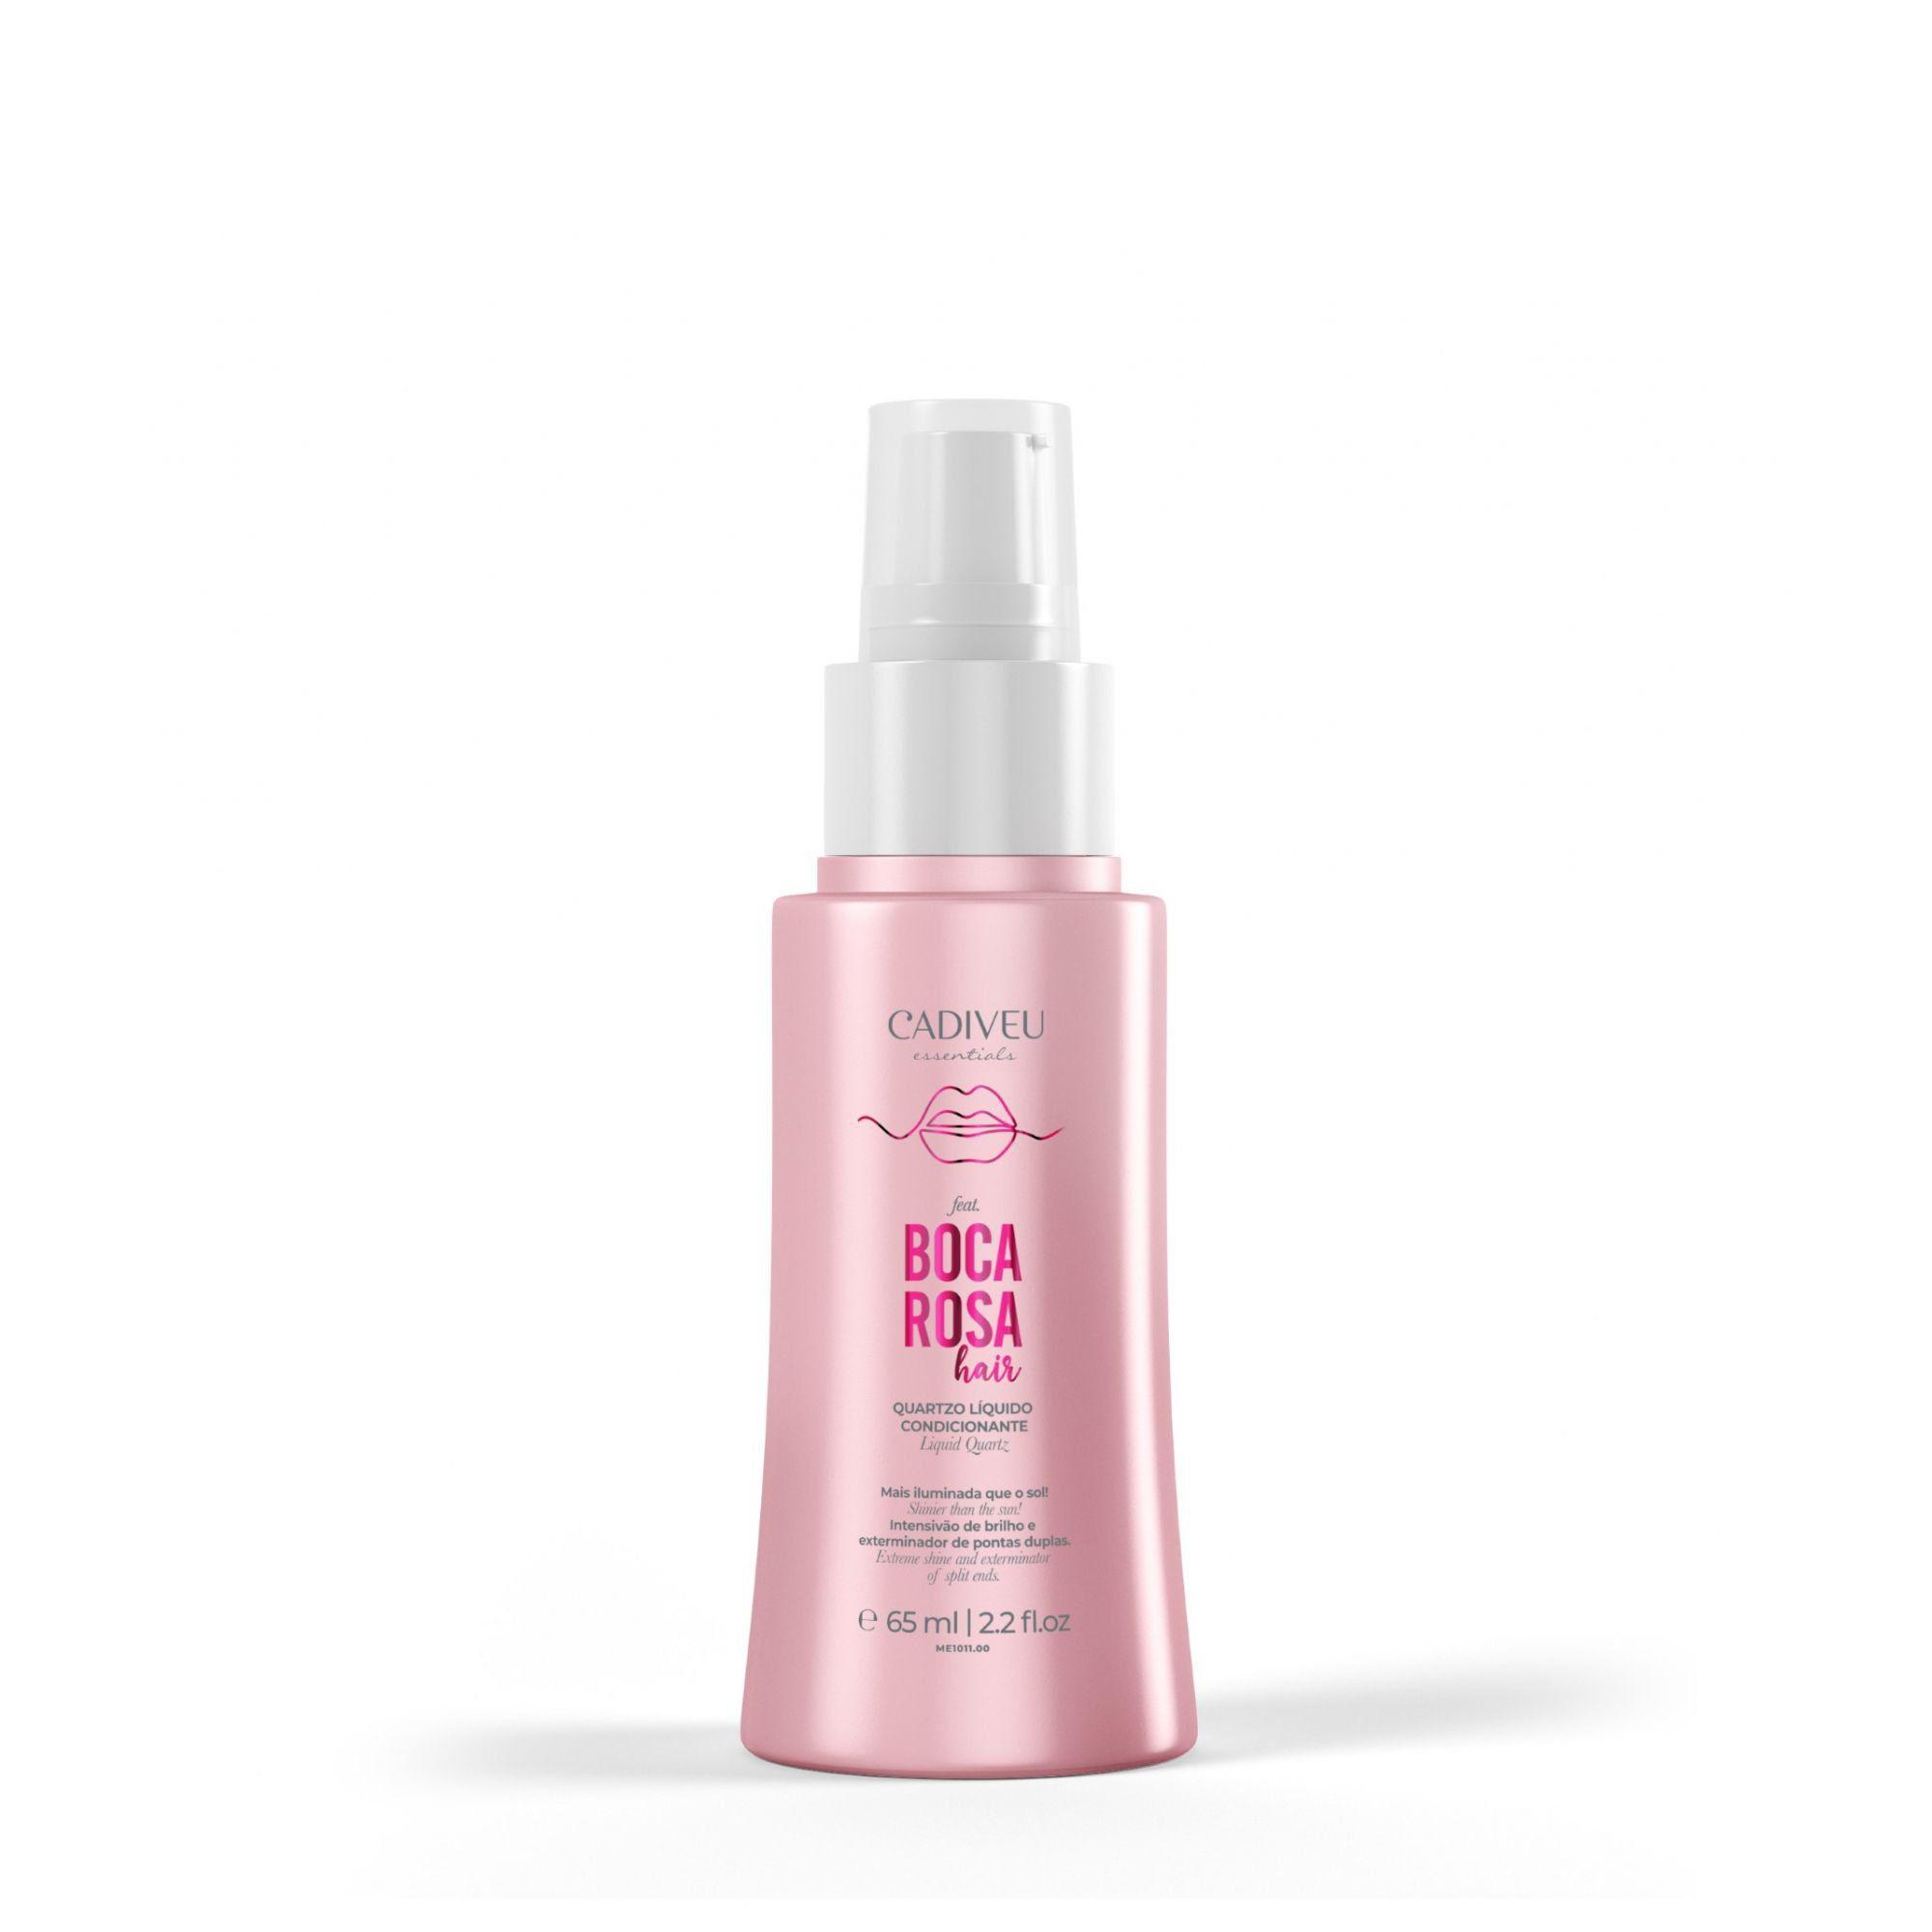 Cadiveu Serum Quartzo Líquido Condicionante Boca Rosa Hair - 65ml